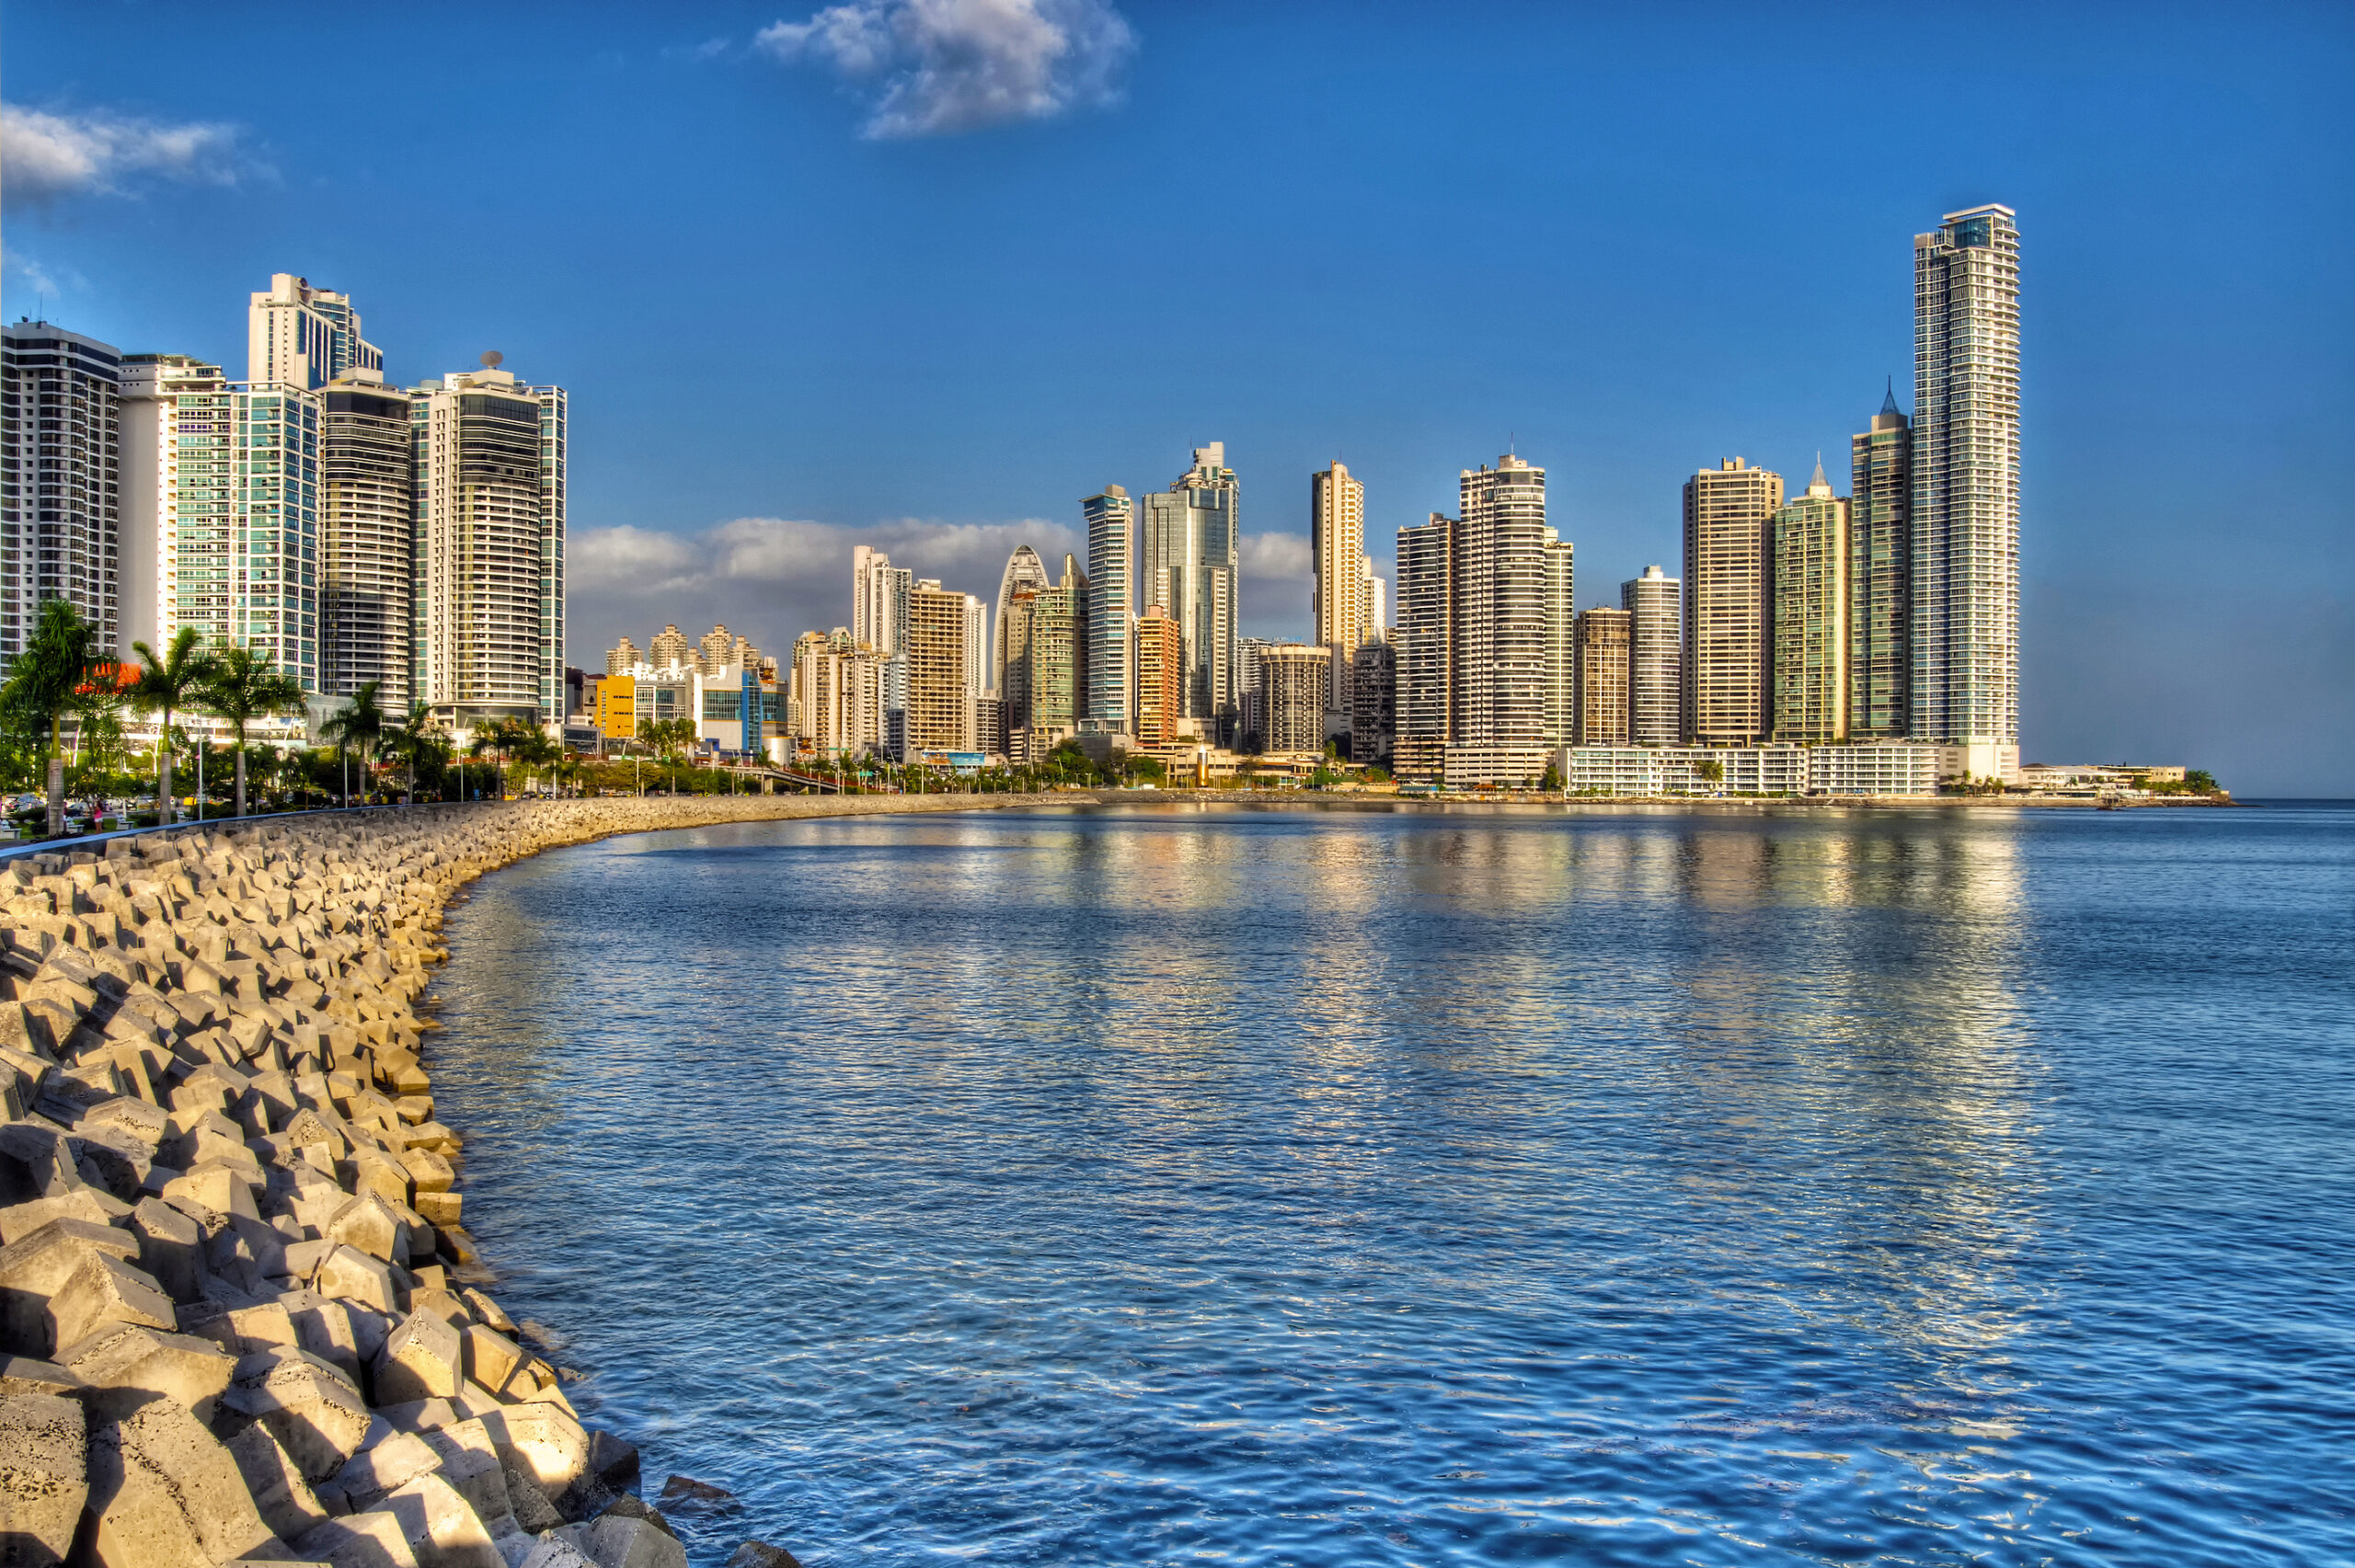 Panama City skyline and the Panama Bay